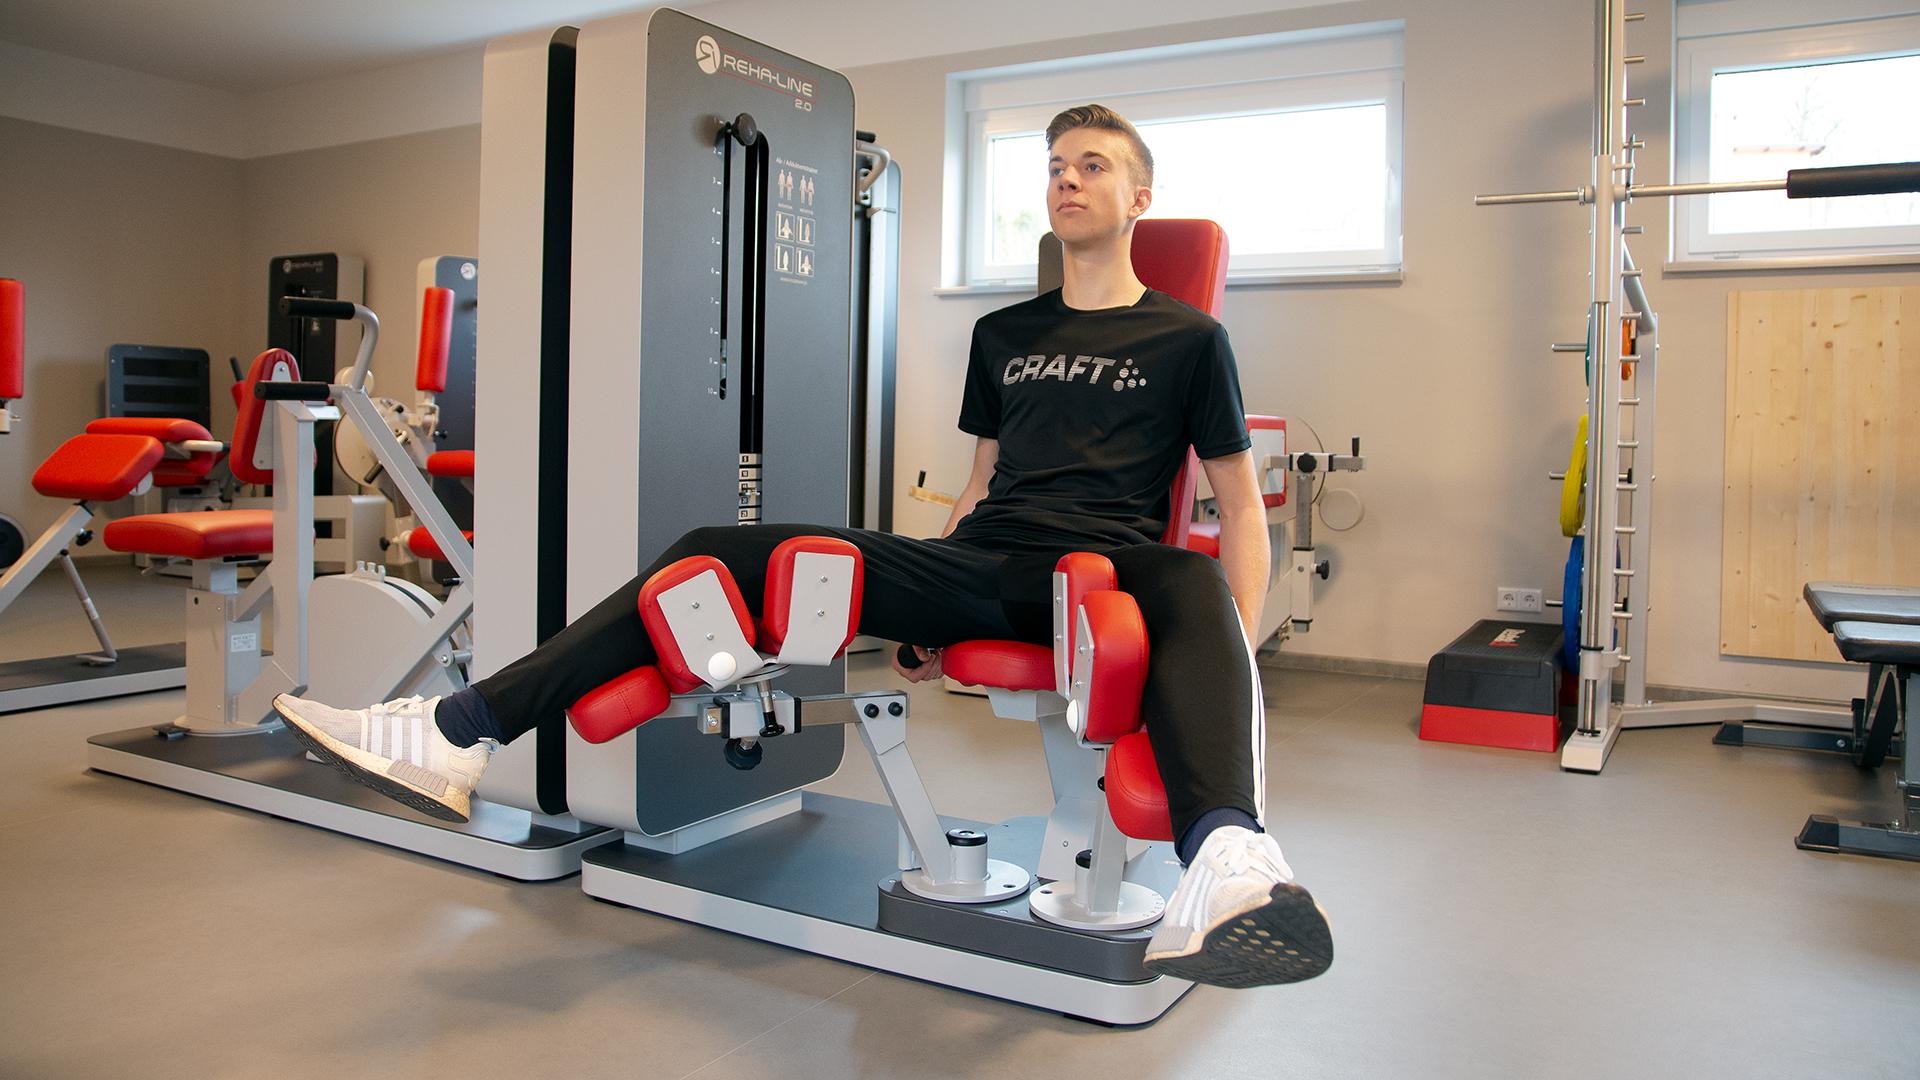 rhoenfit_fitnessstudio_geraete_beinpresse_bertsch_020319